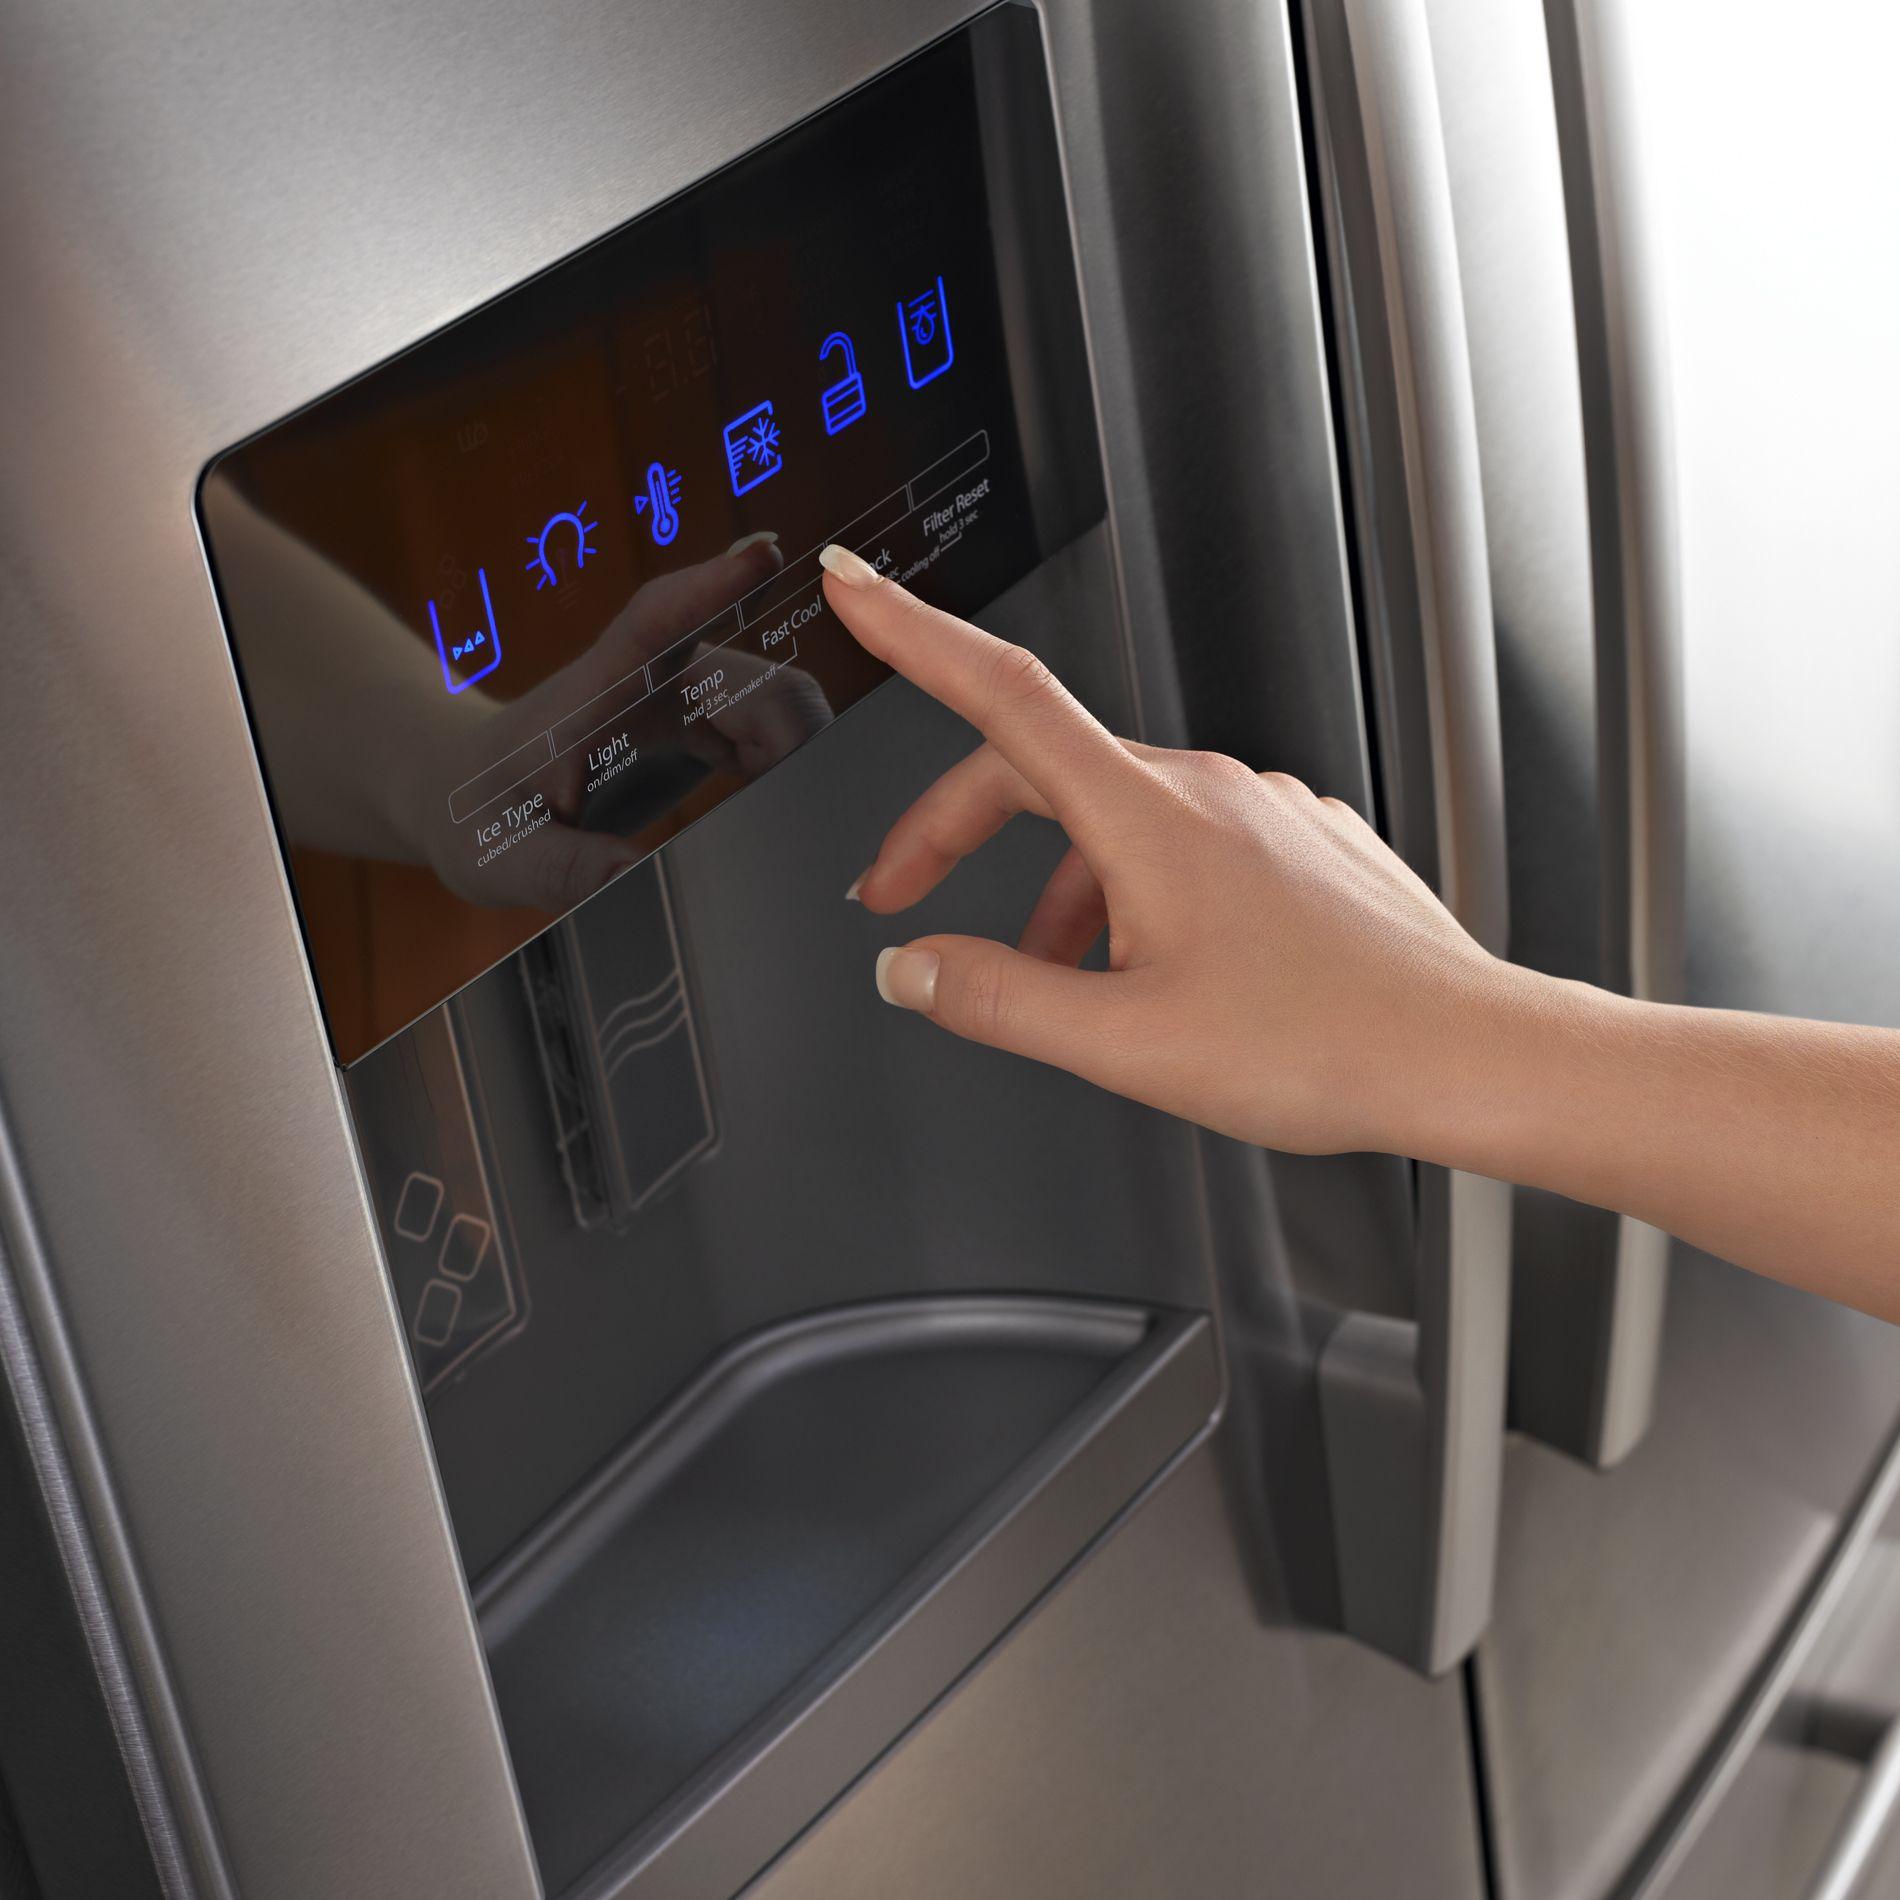 Whirlpool Gold 25.5 cu. ft. French-Door Bottom-Freezer Refrigerator